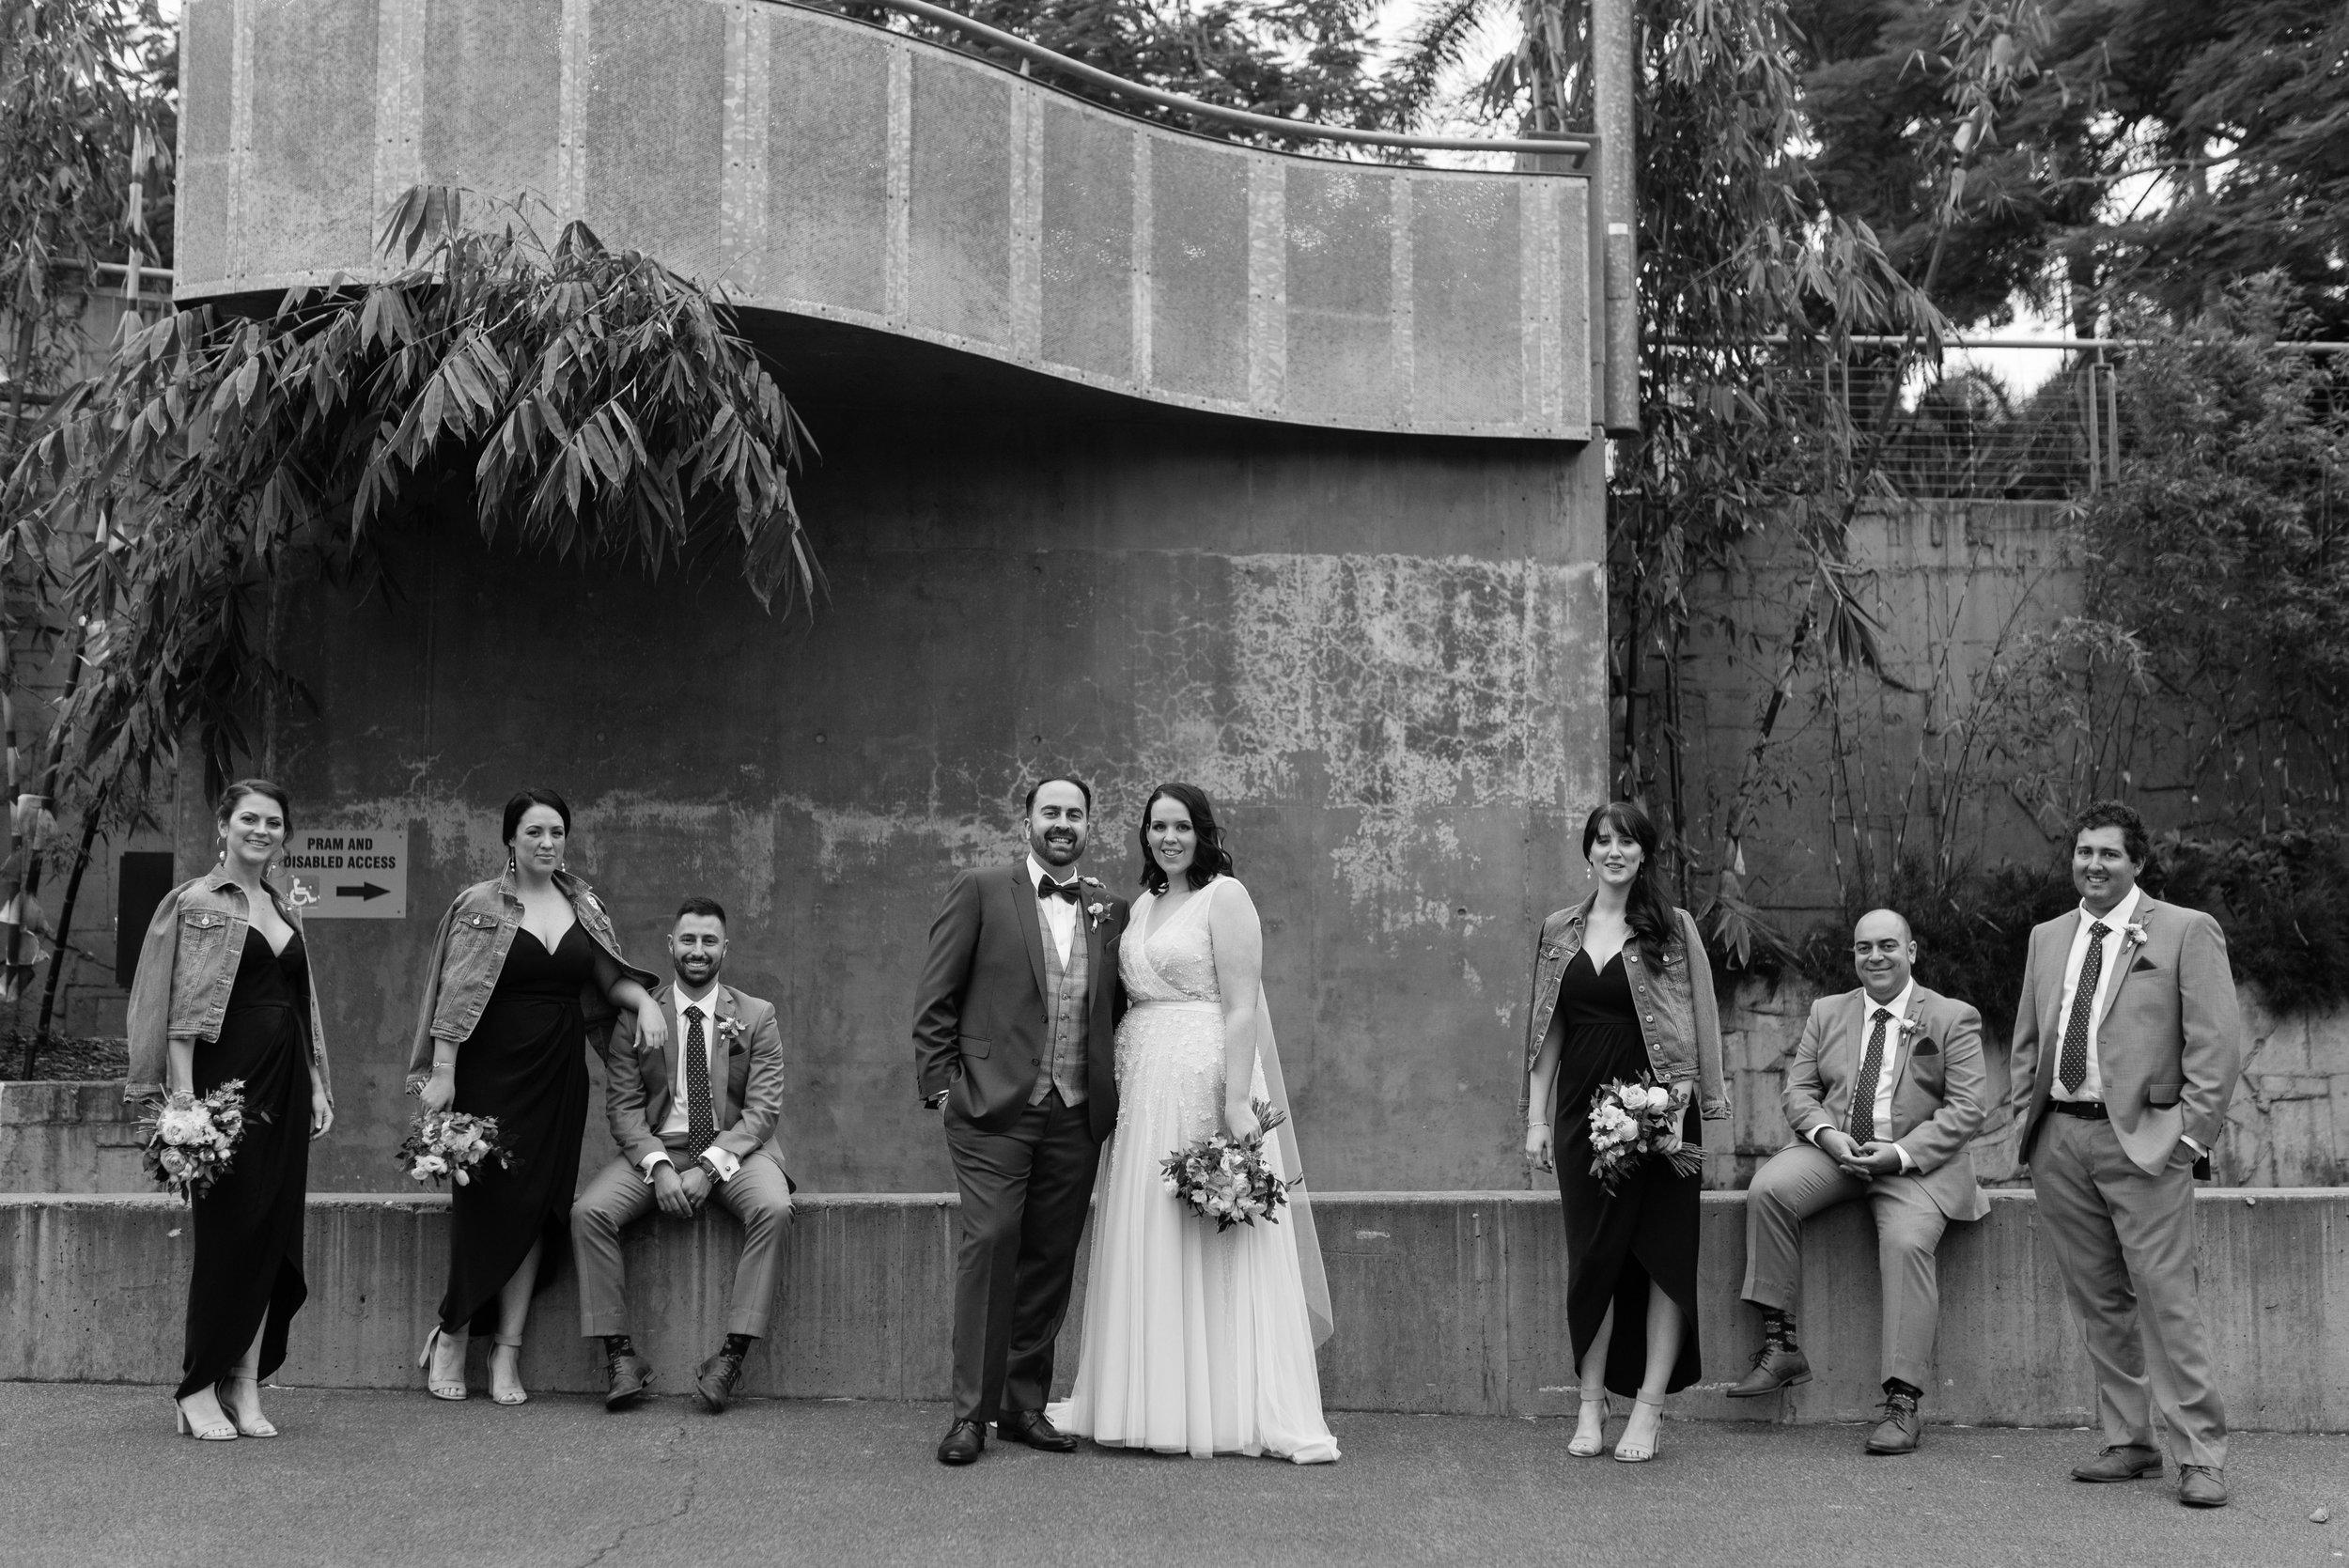 brisbane-city-wedding-photographer-romantic-wedding-71.jpg